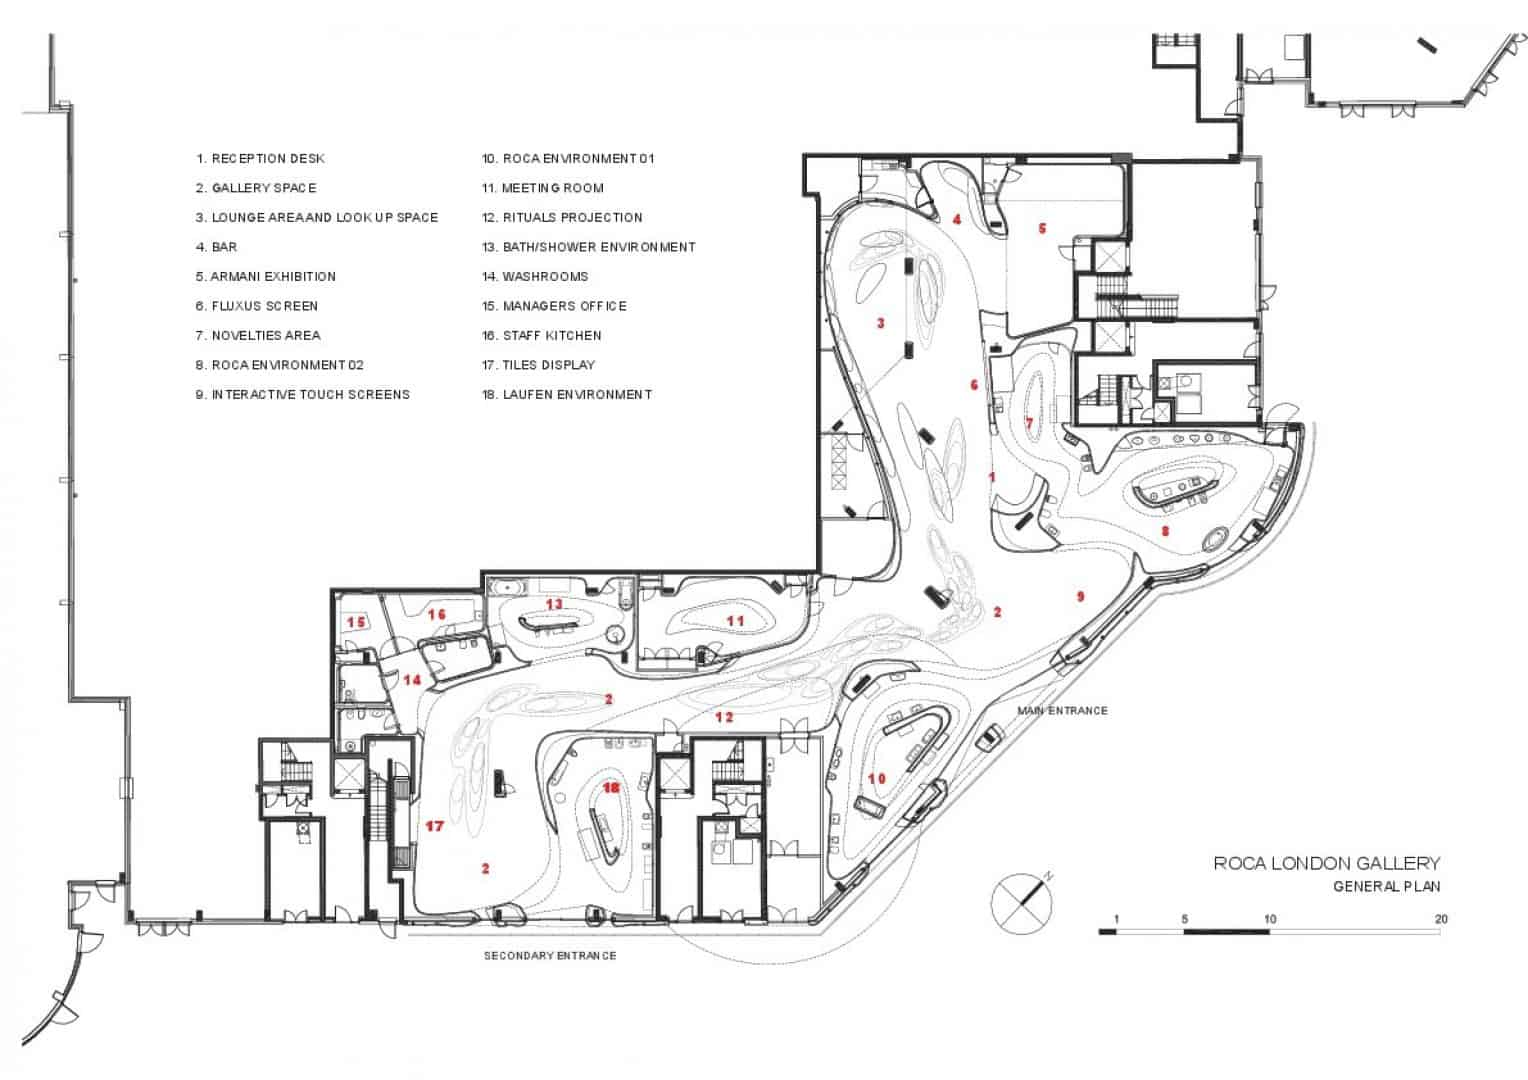 Zaha Hadid Product Design - the roca gallery london 1